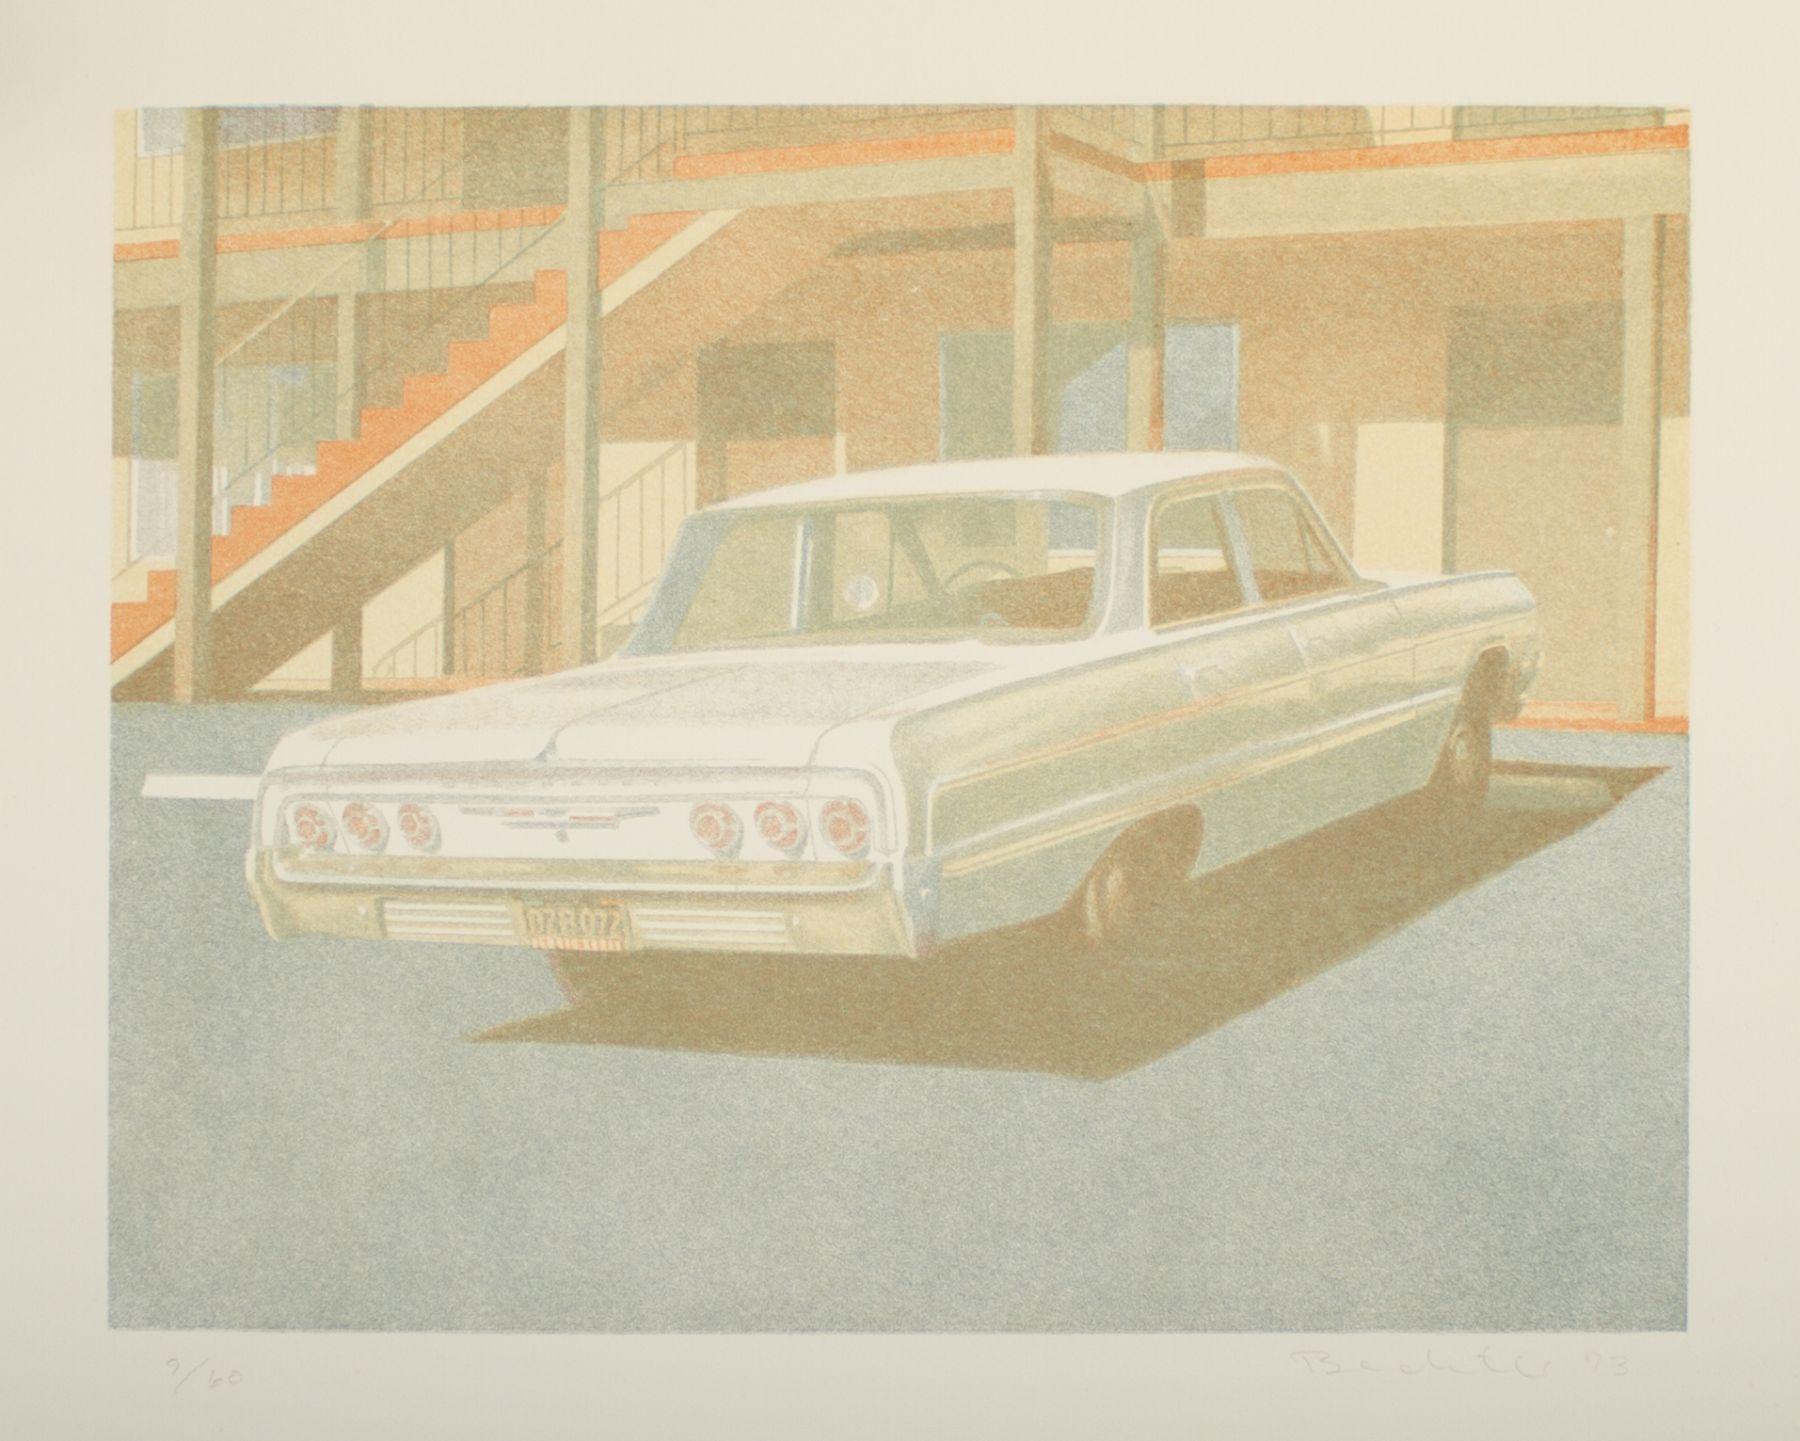 Robert Bechtle '64 Impala, 1973